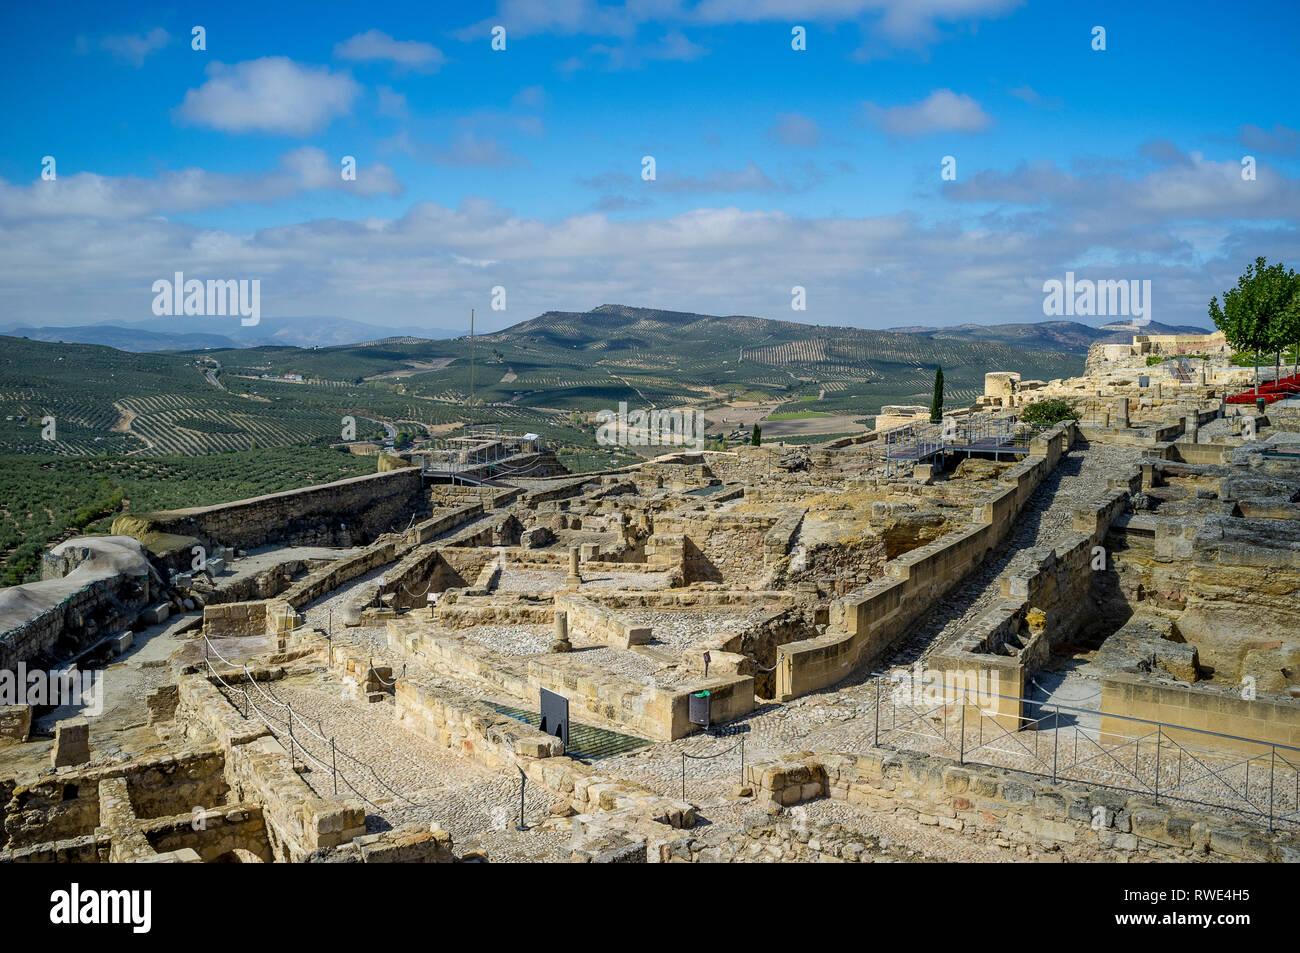 Current excavations and restoration at hilltop Alcala la Real Castle - Fortaleza de la Mota - and landscape in Jaen Province, Andalusia, Spain - Stock Image